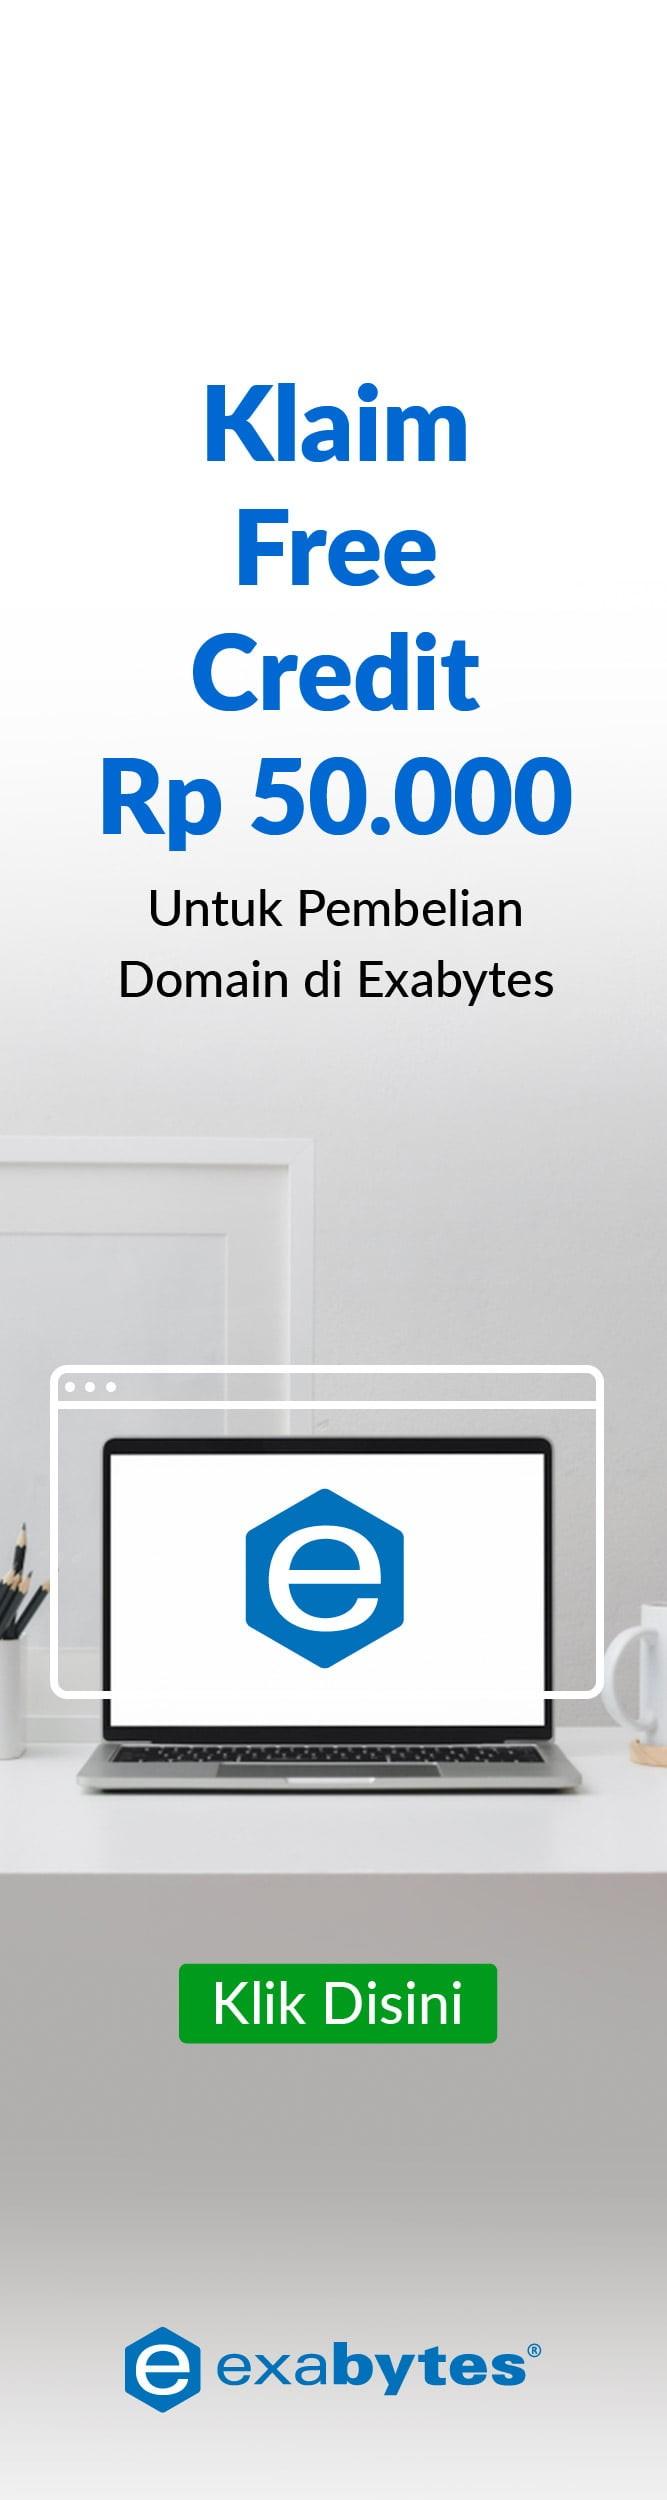 Free Credit Exabytes